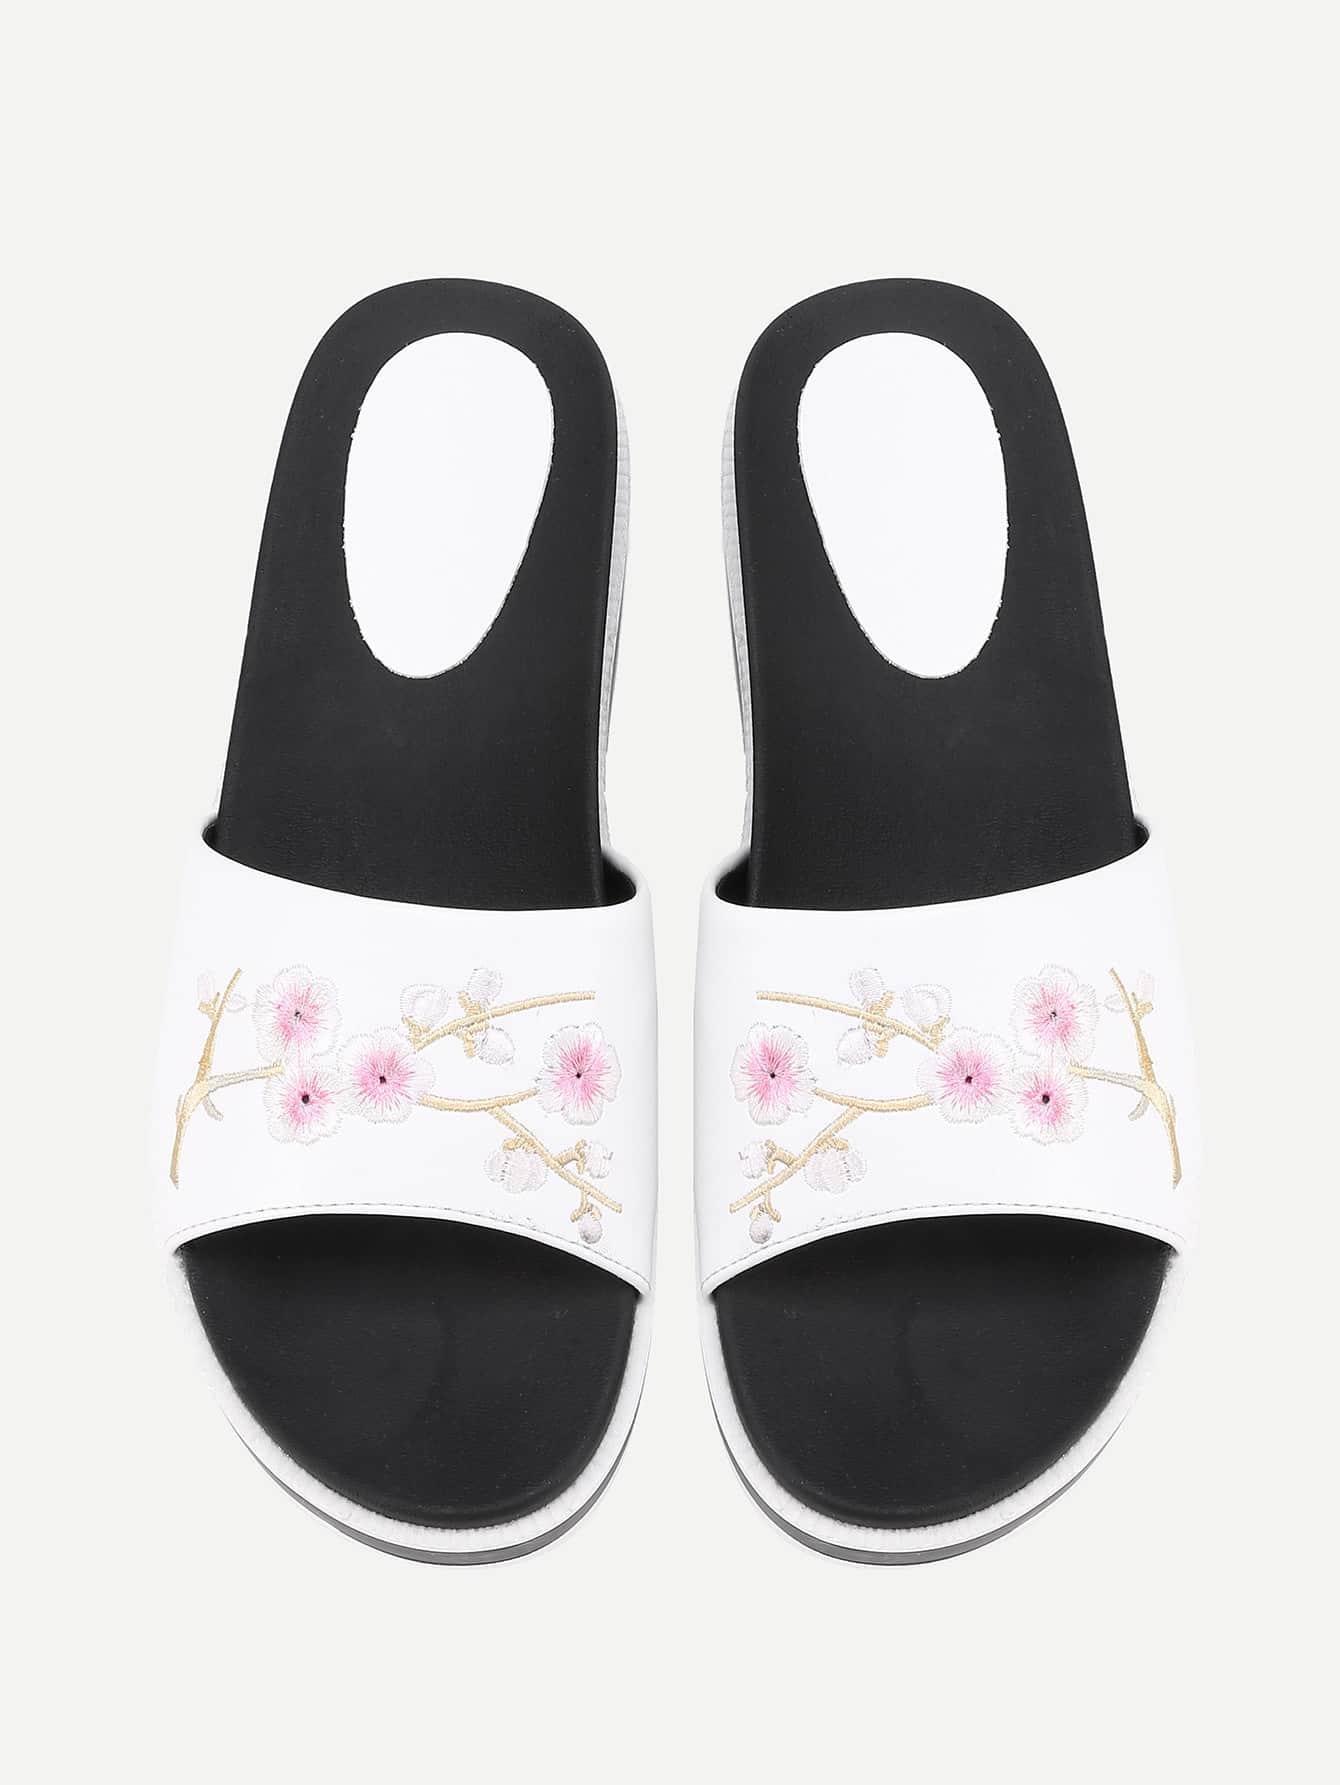 Фото Calico Embroidery Flat Sliders. Купить с доставкой